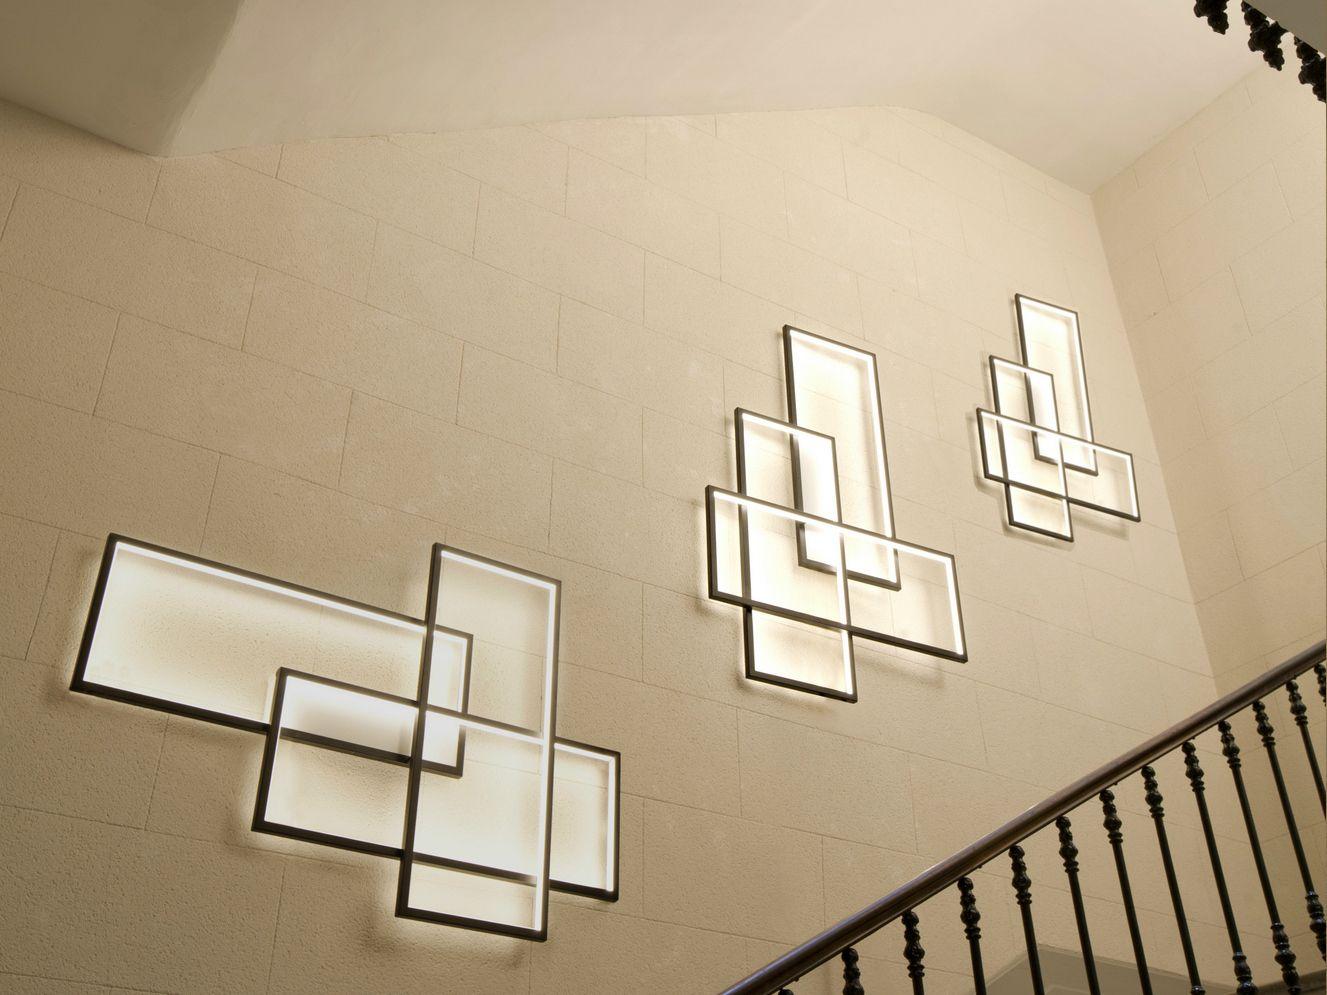 Trio lt lightings pinterest verlichting verlichting ideeën